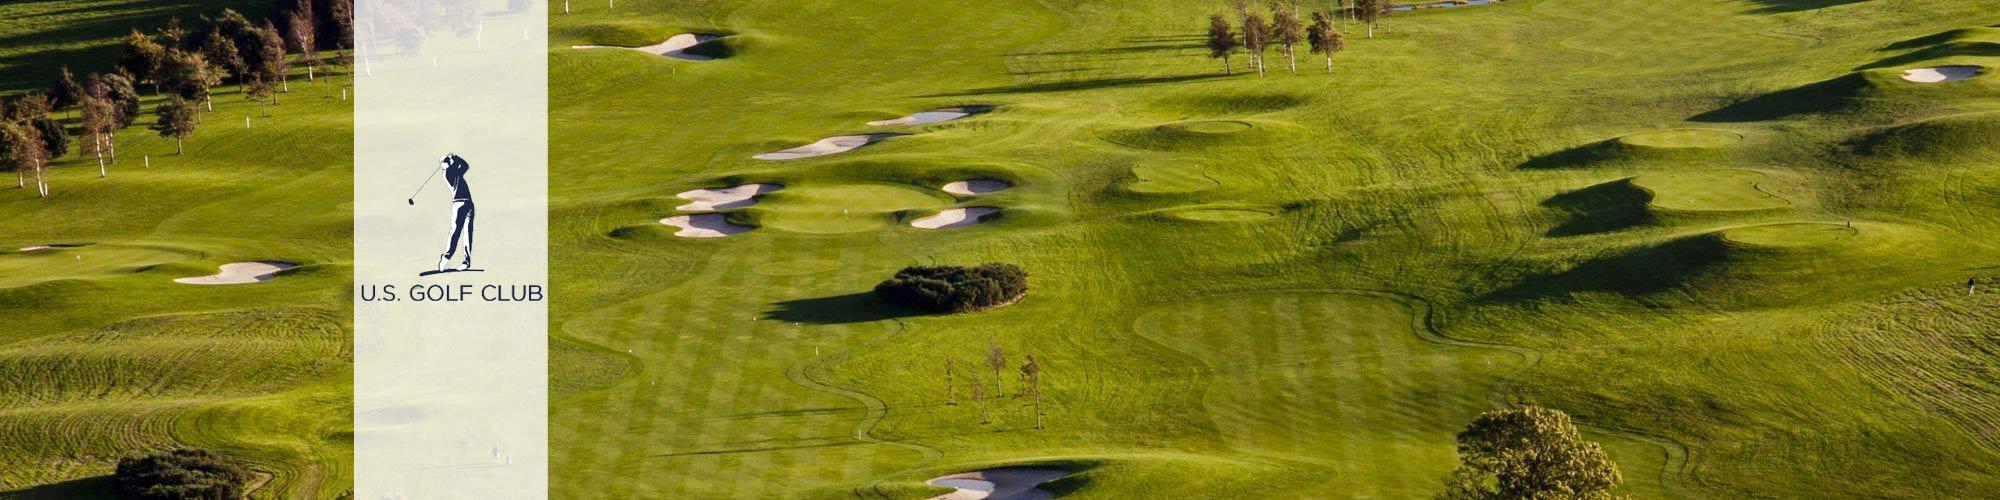 3u.s.-golf-club